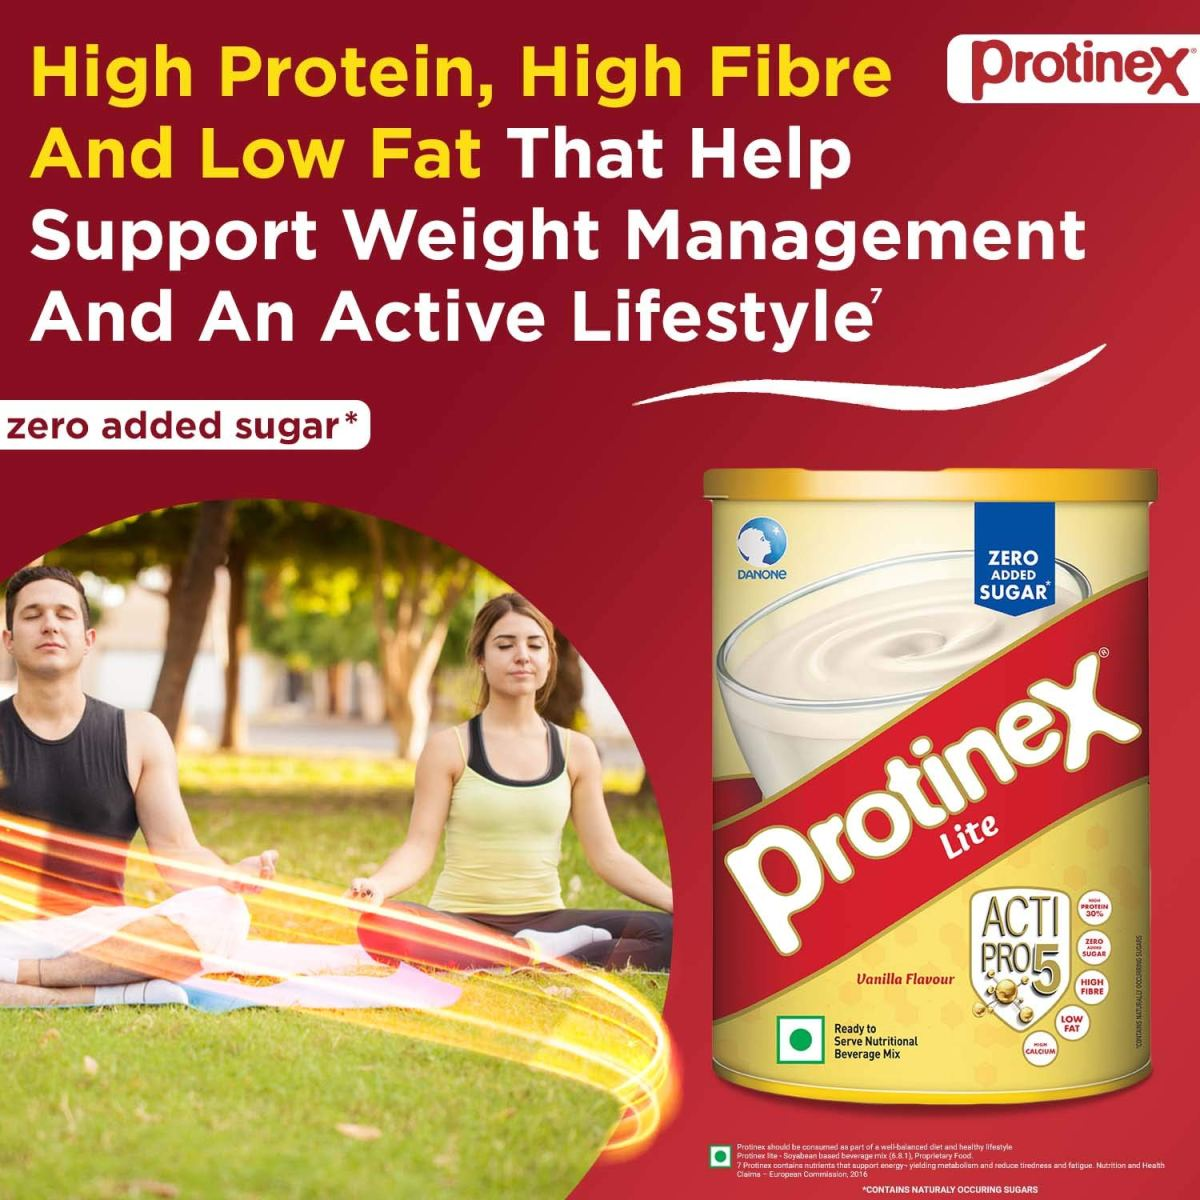 Protinex Lite Vanilla INGREDIENTS